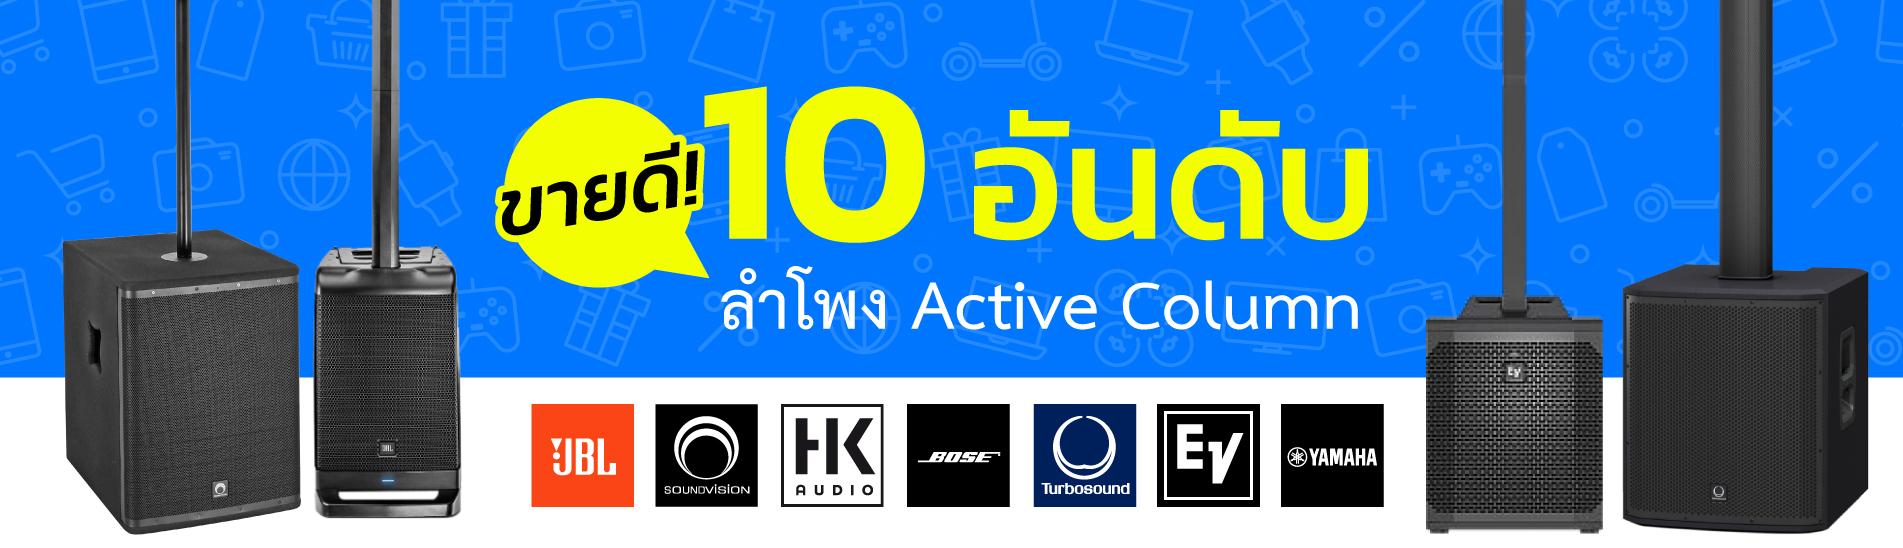 10-Best-sale